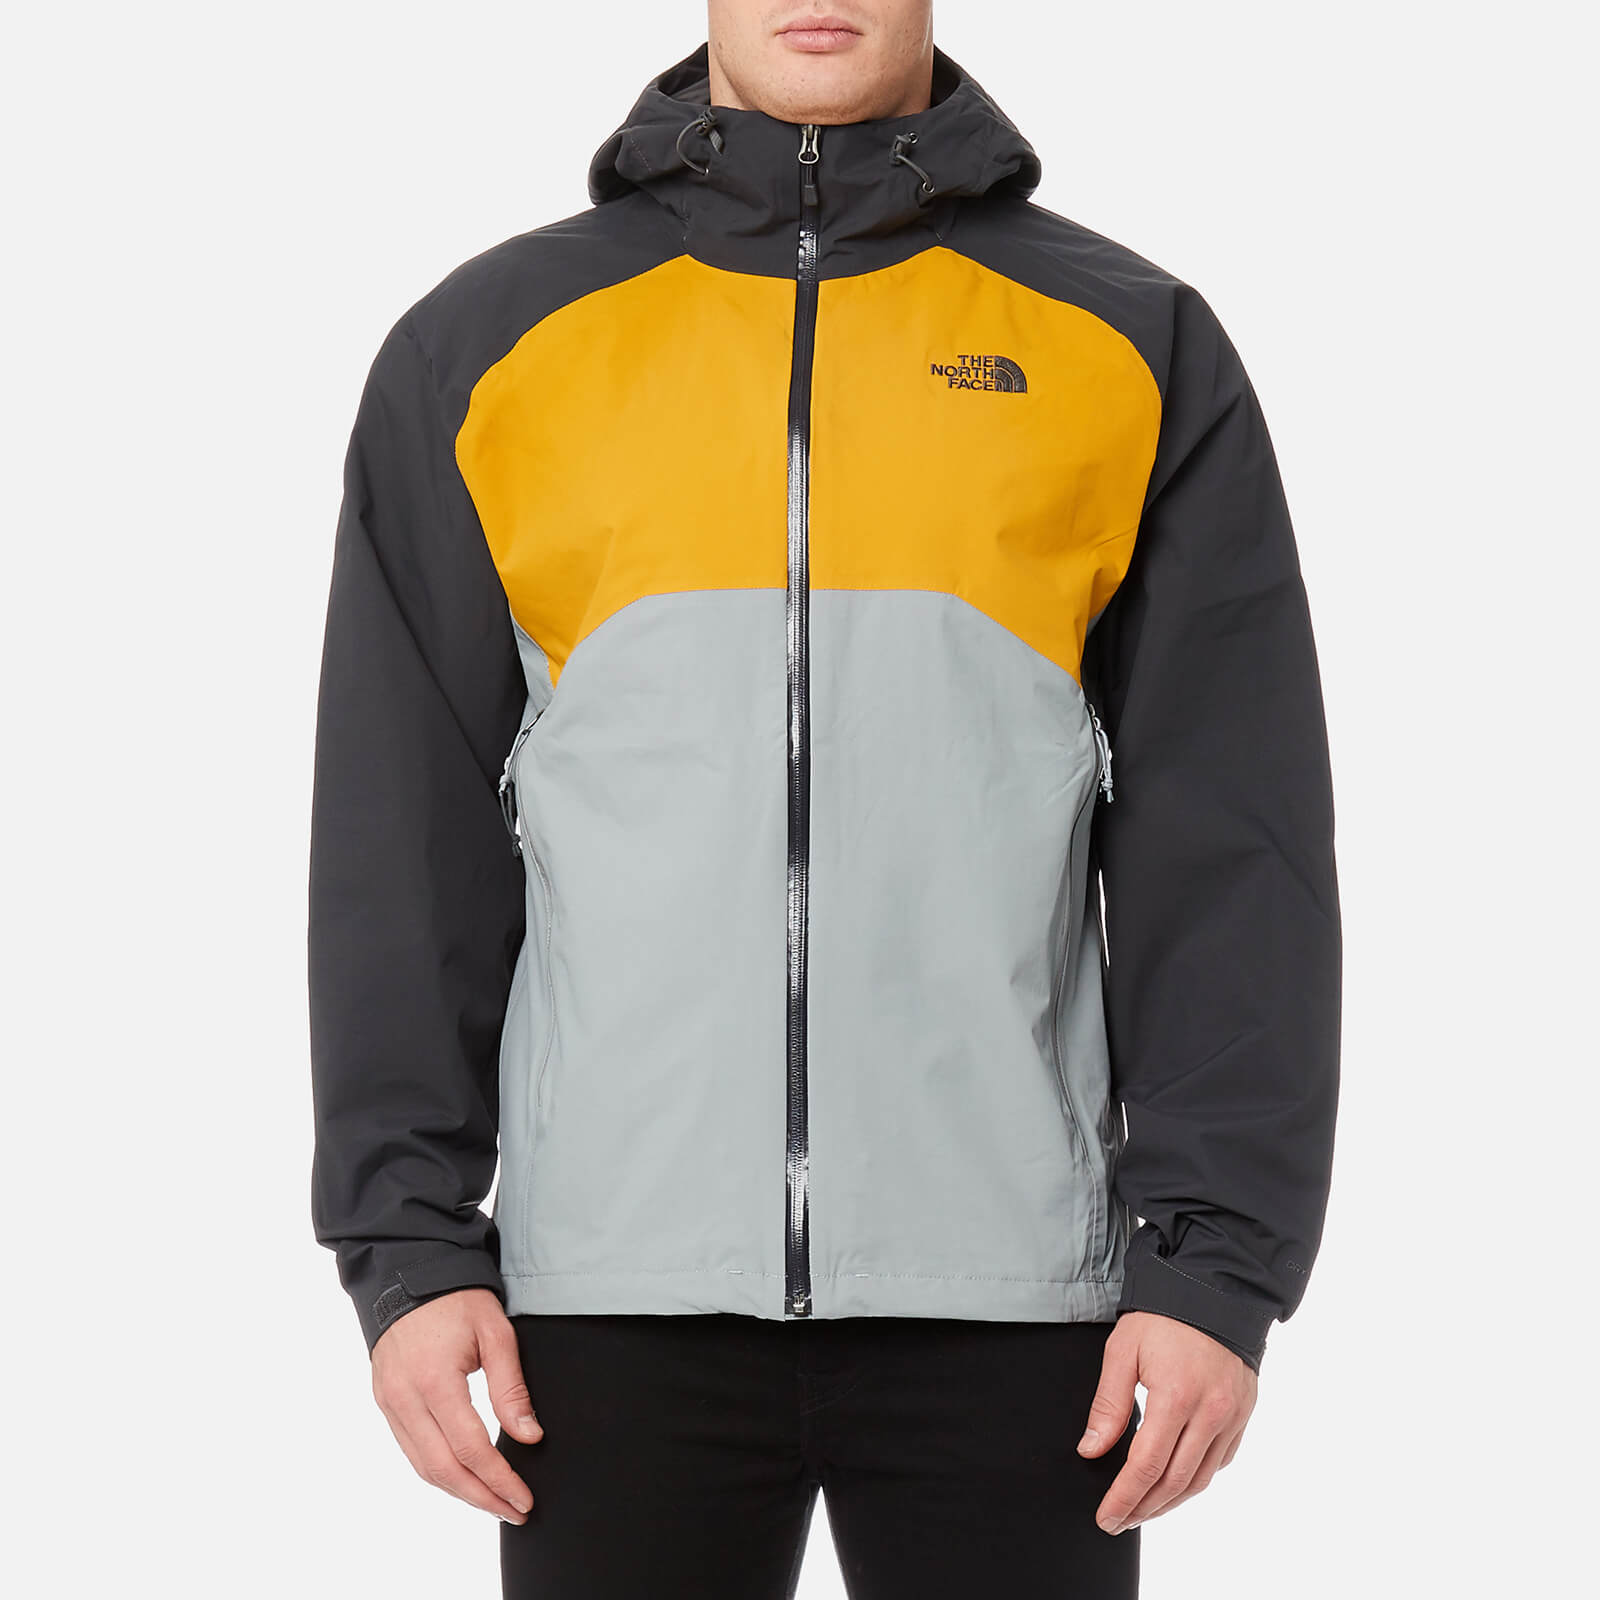 f351c46d6475 The North Face Men s Stratos Jacket - Asphalt Grey Arrowwood  Yellow Monument Grey Clothing